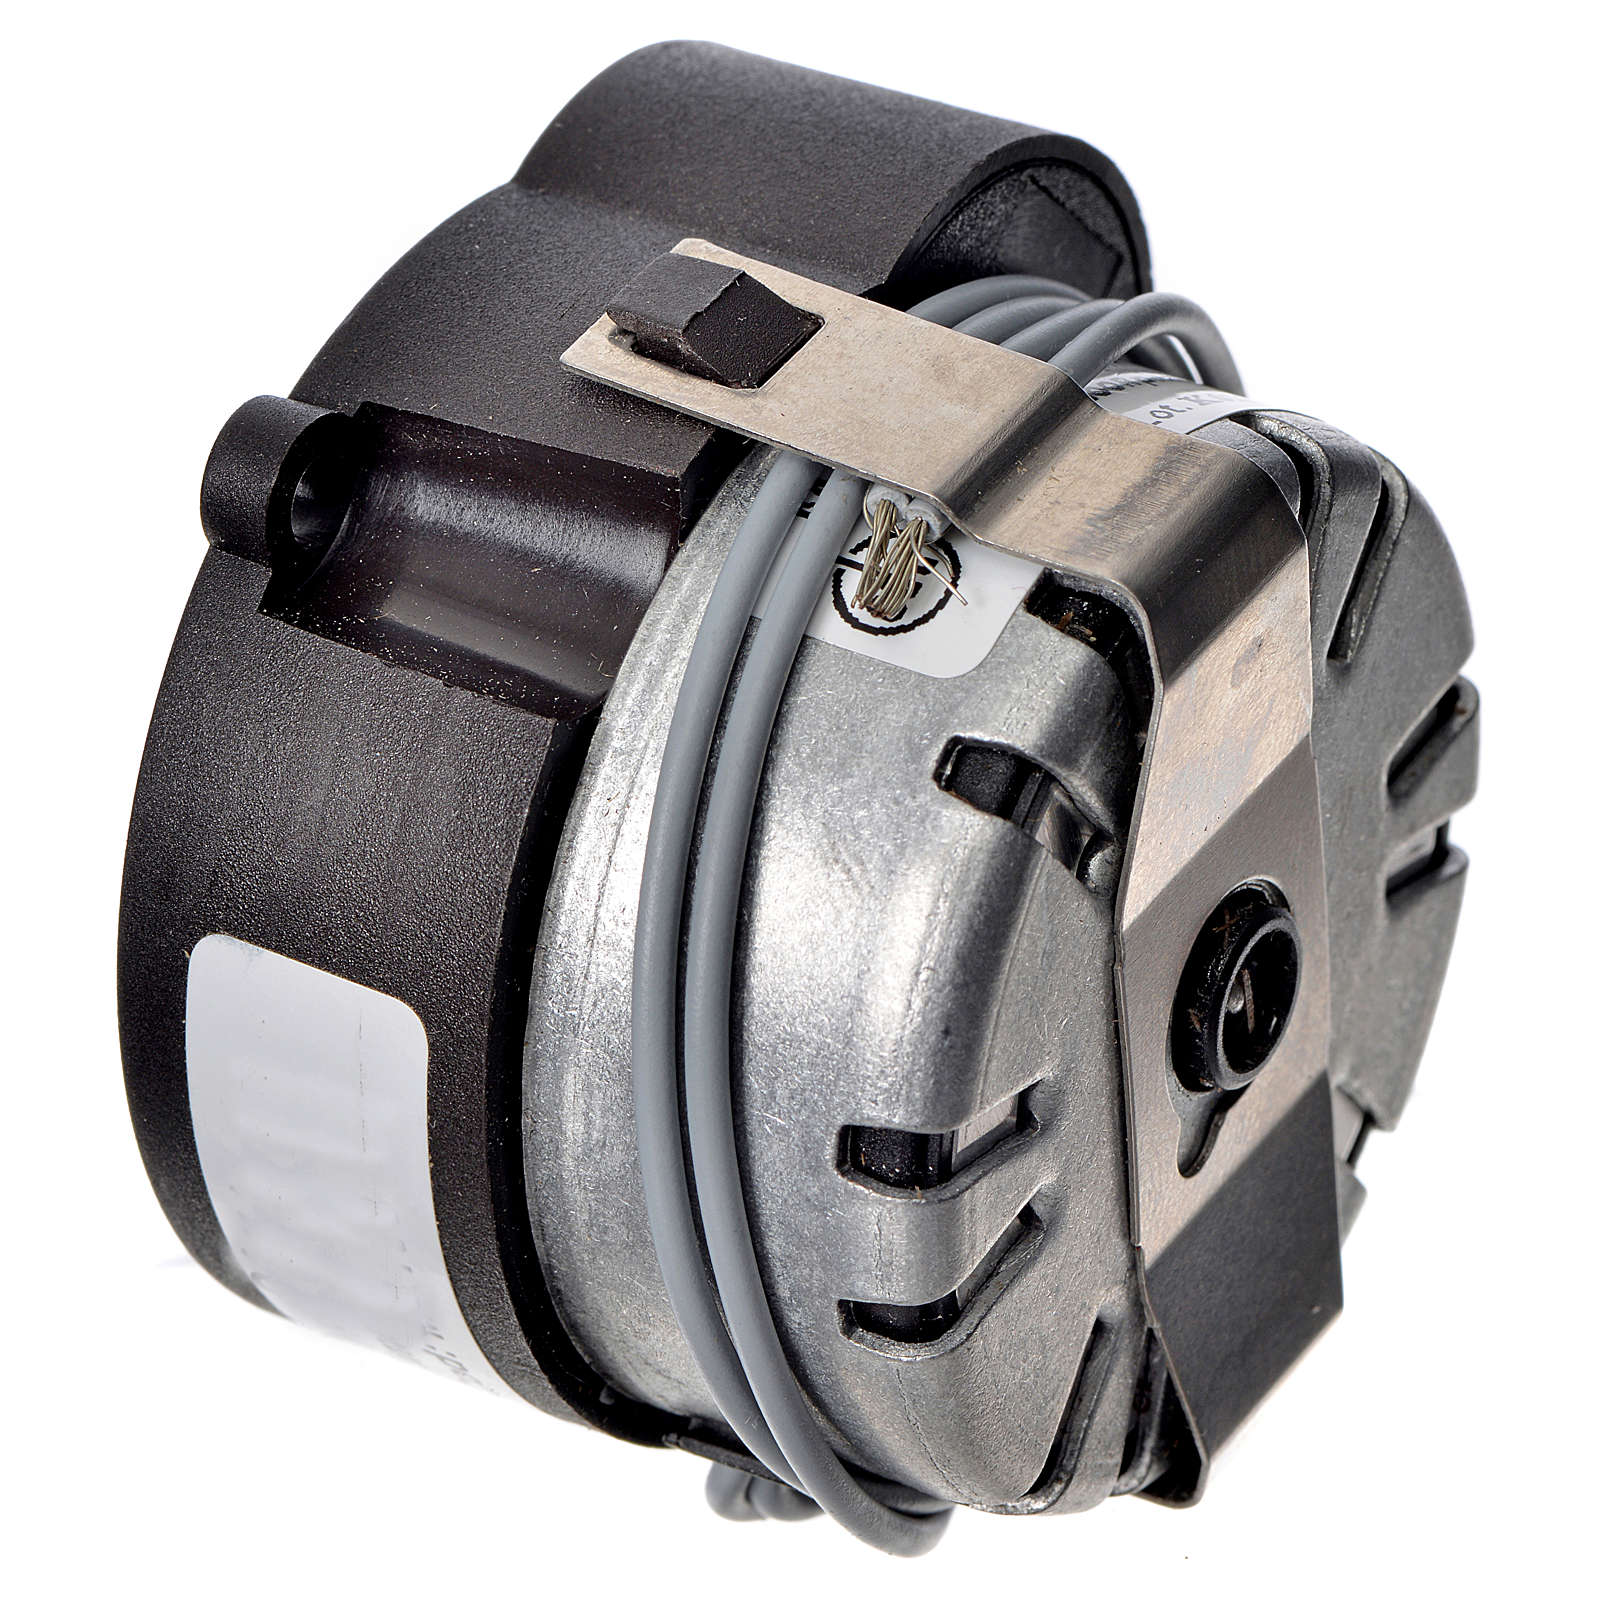 Motoriduttore presepe  MR giri/minuto 4 4